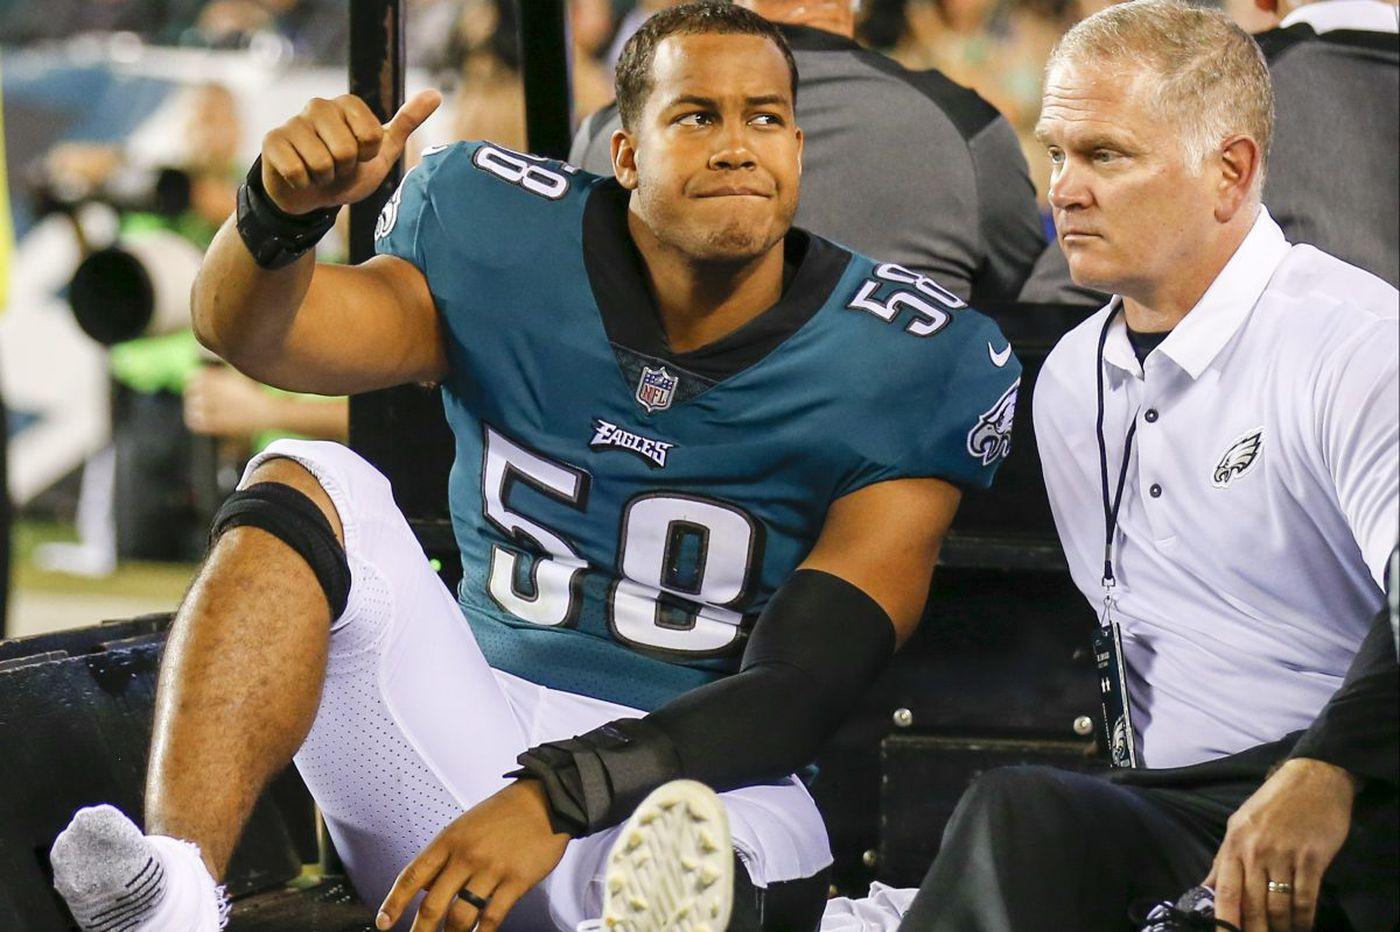 Source: Eagles linebacker Jordan Hicks has torn Achilles tendon